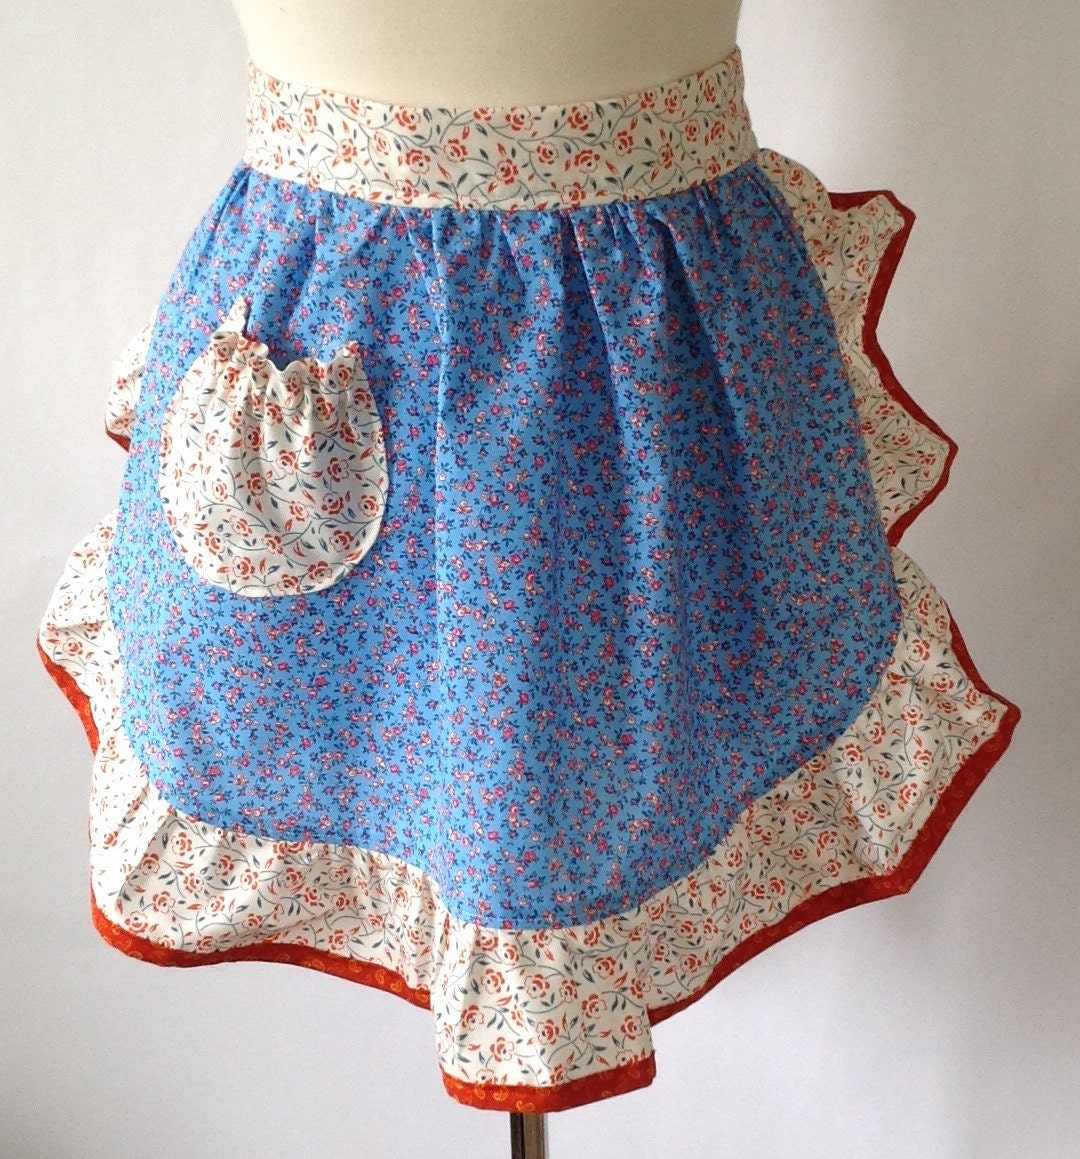 White waist apron ruffle - Half Apron Blue Country Flowers Pink Rosebuds Waist Apron Ruffled Apron